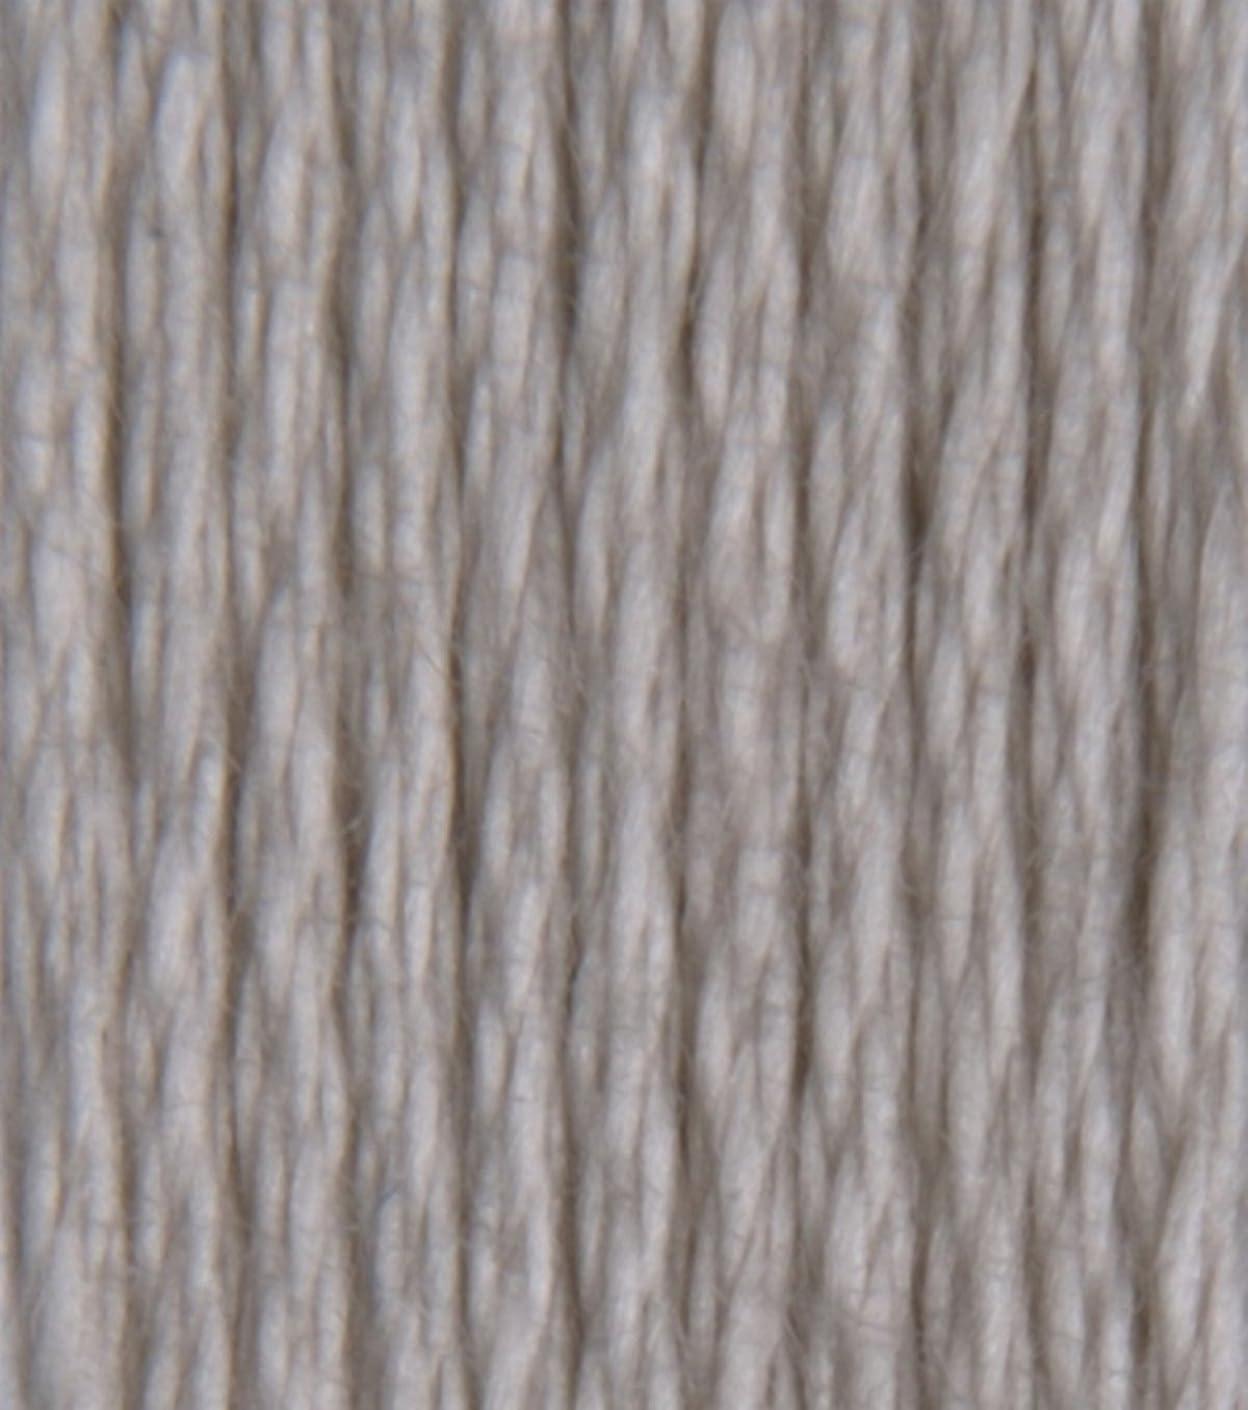 DMC 115 5-822 Pearl Cotton Thread, Light Beige Grey, Size 5